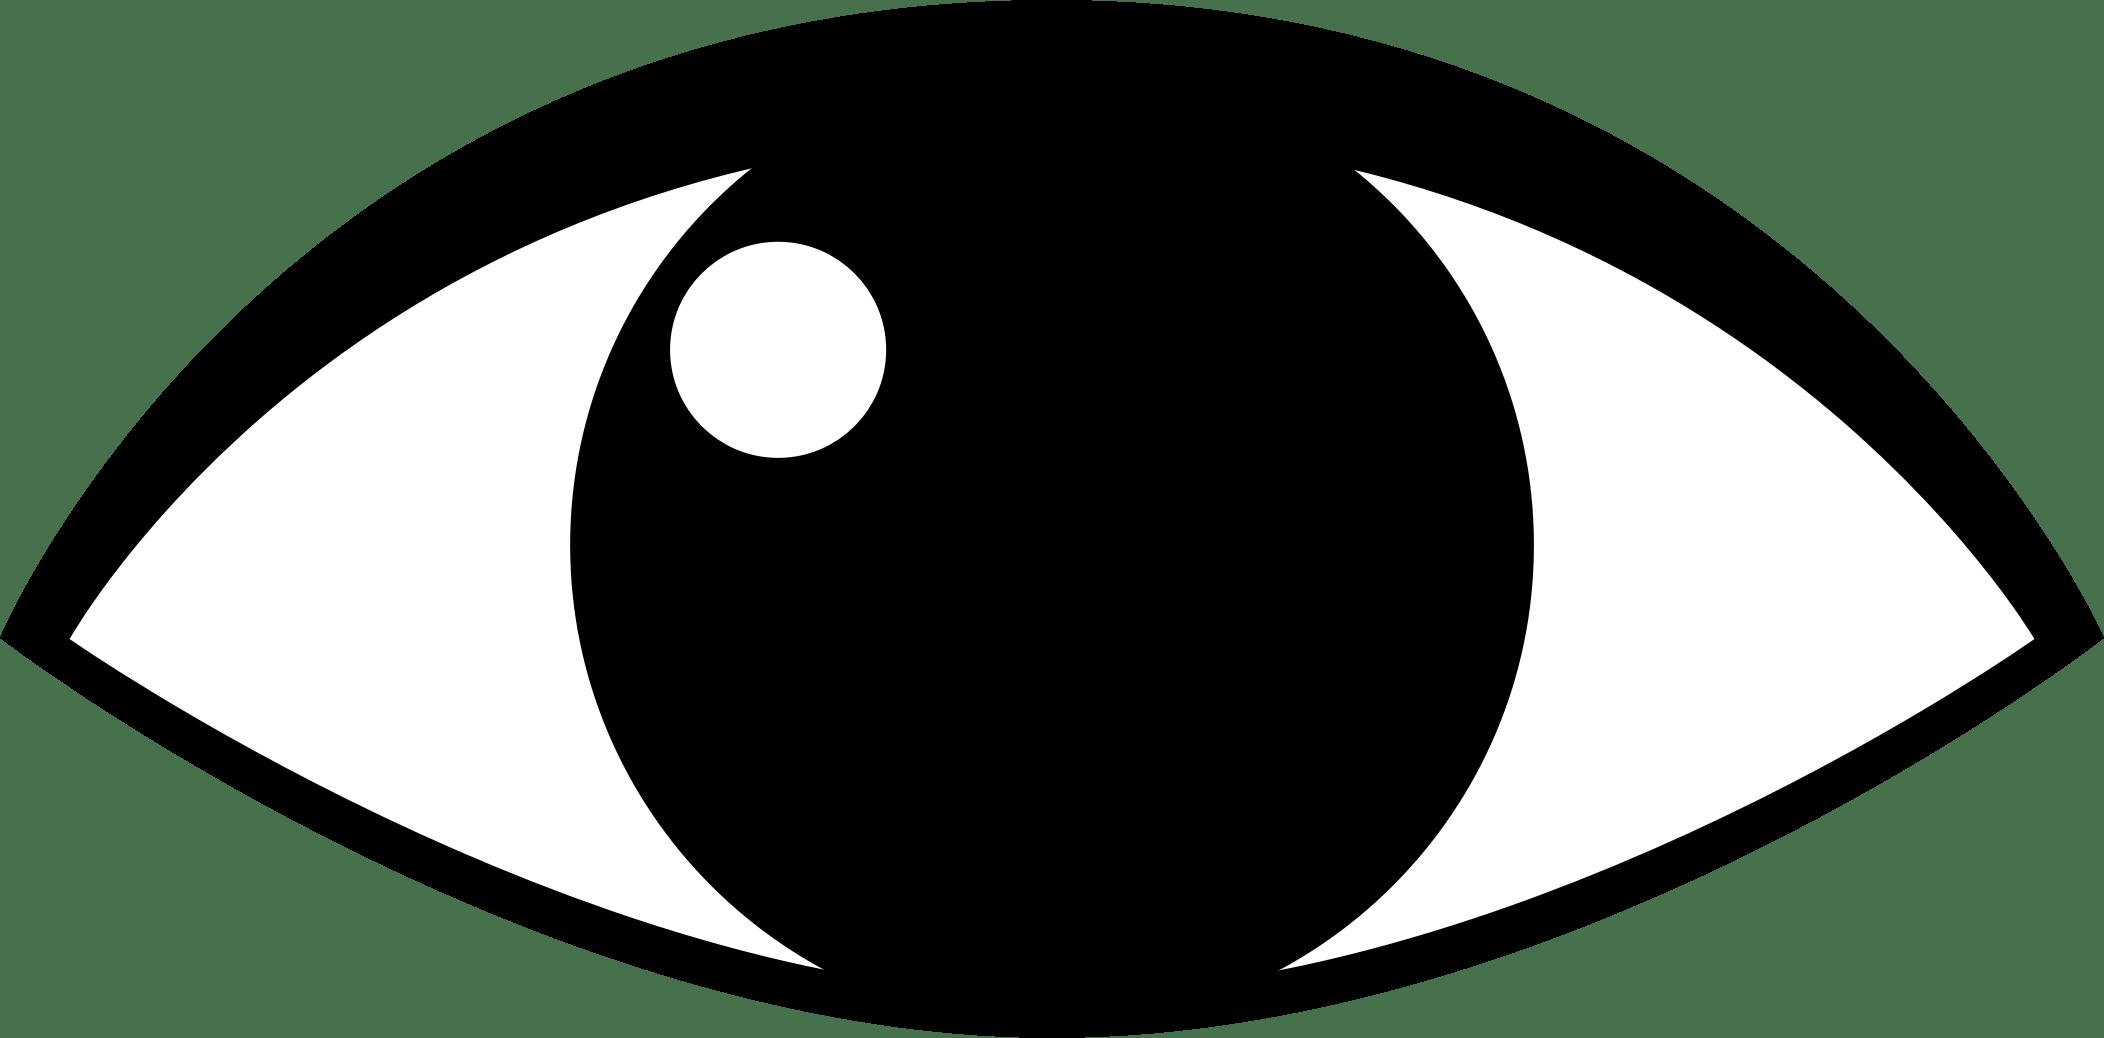 cartoon eyes clipart free - Clipground (2104 x 1038 Pixel)